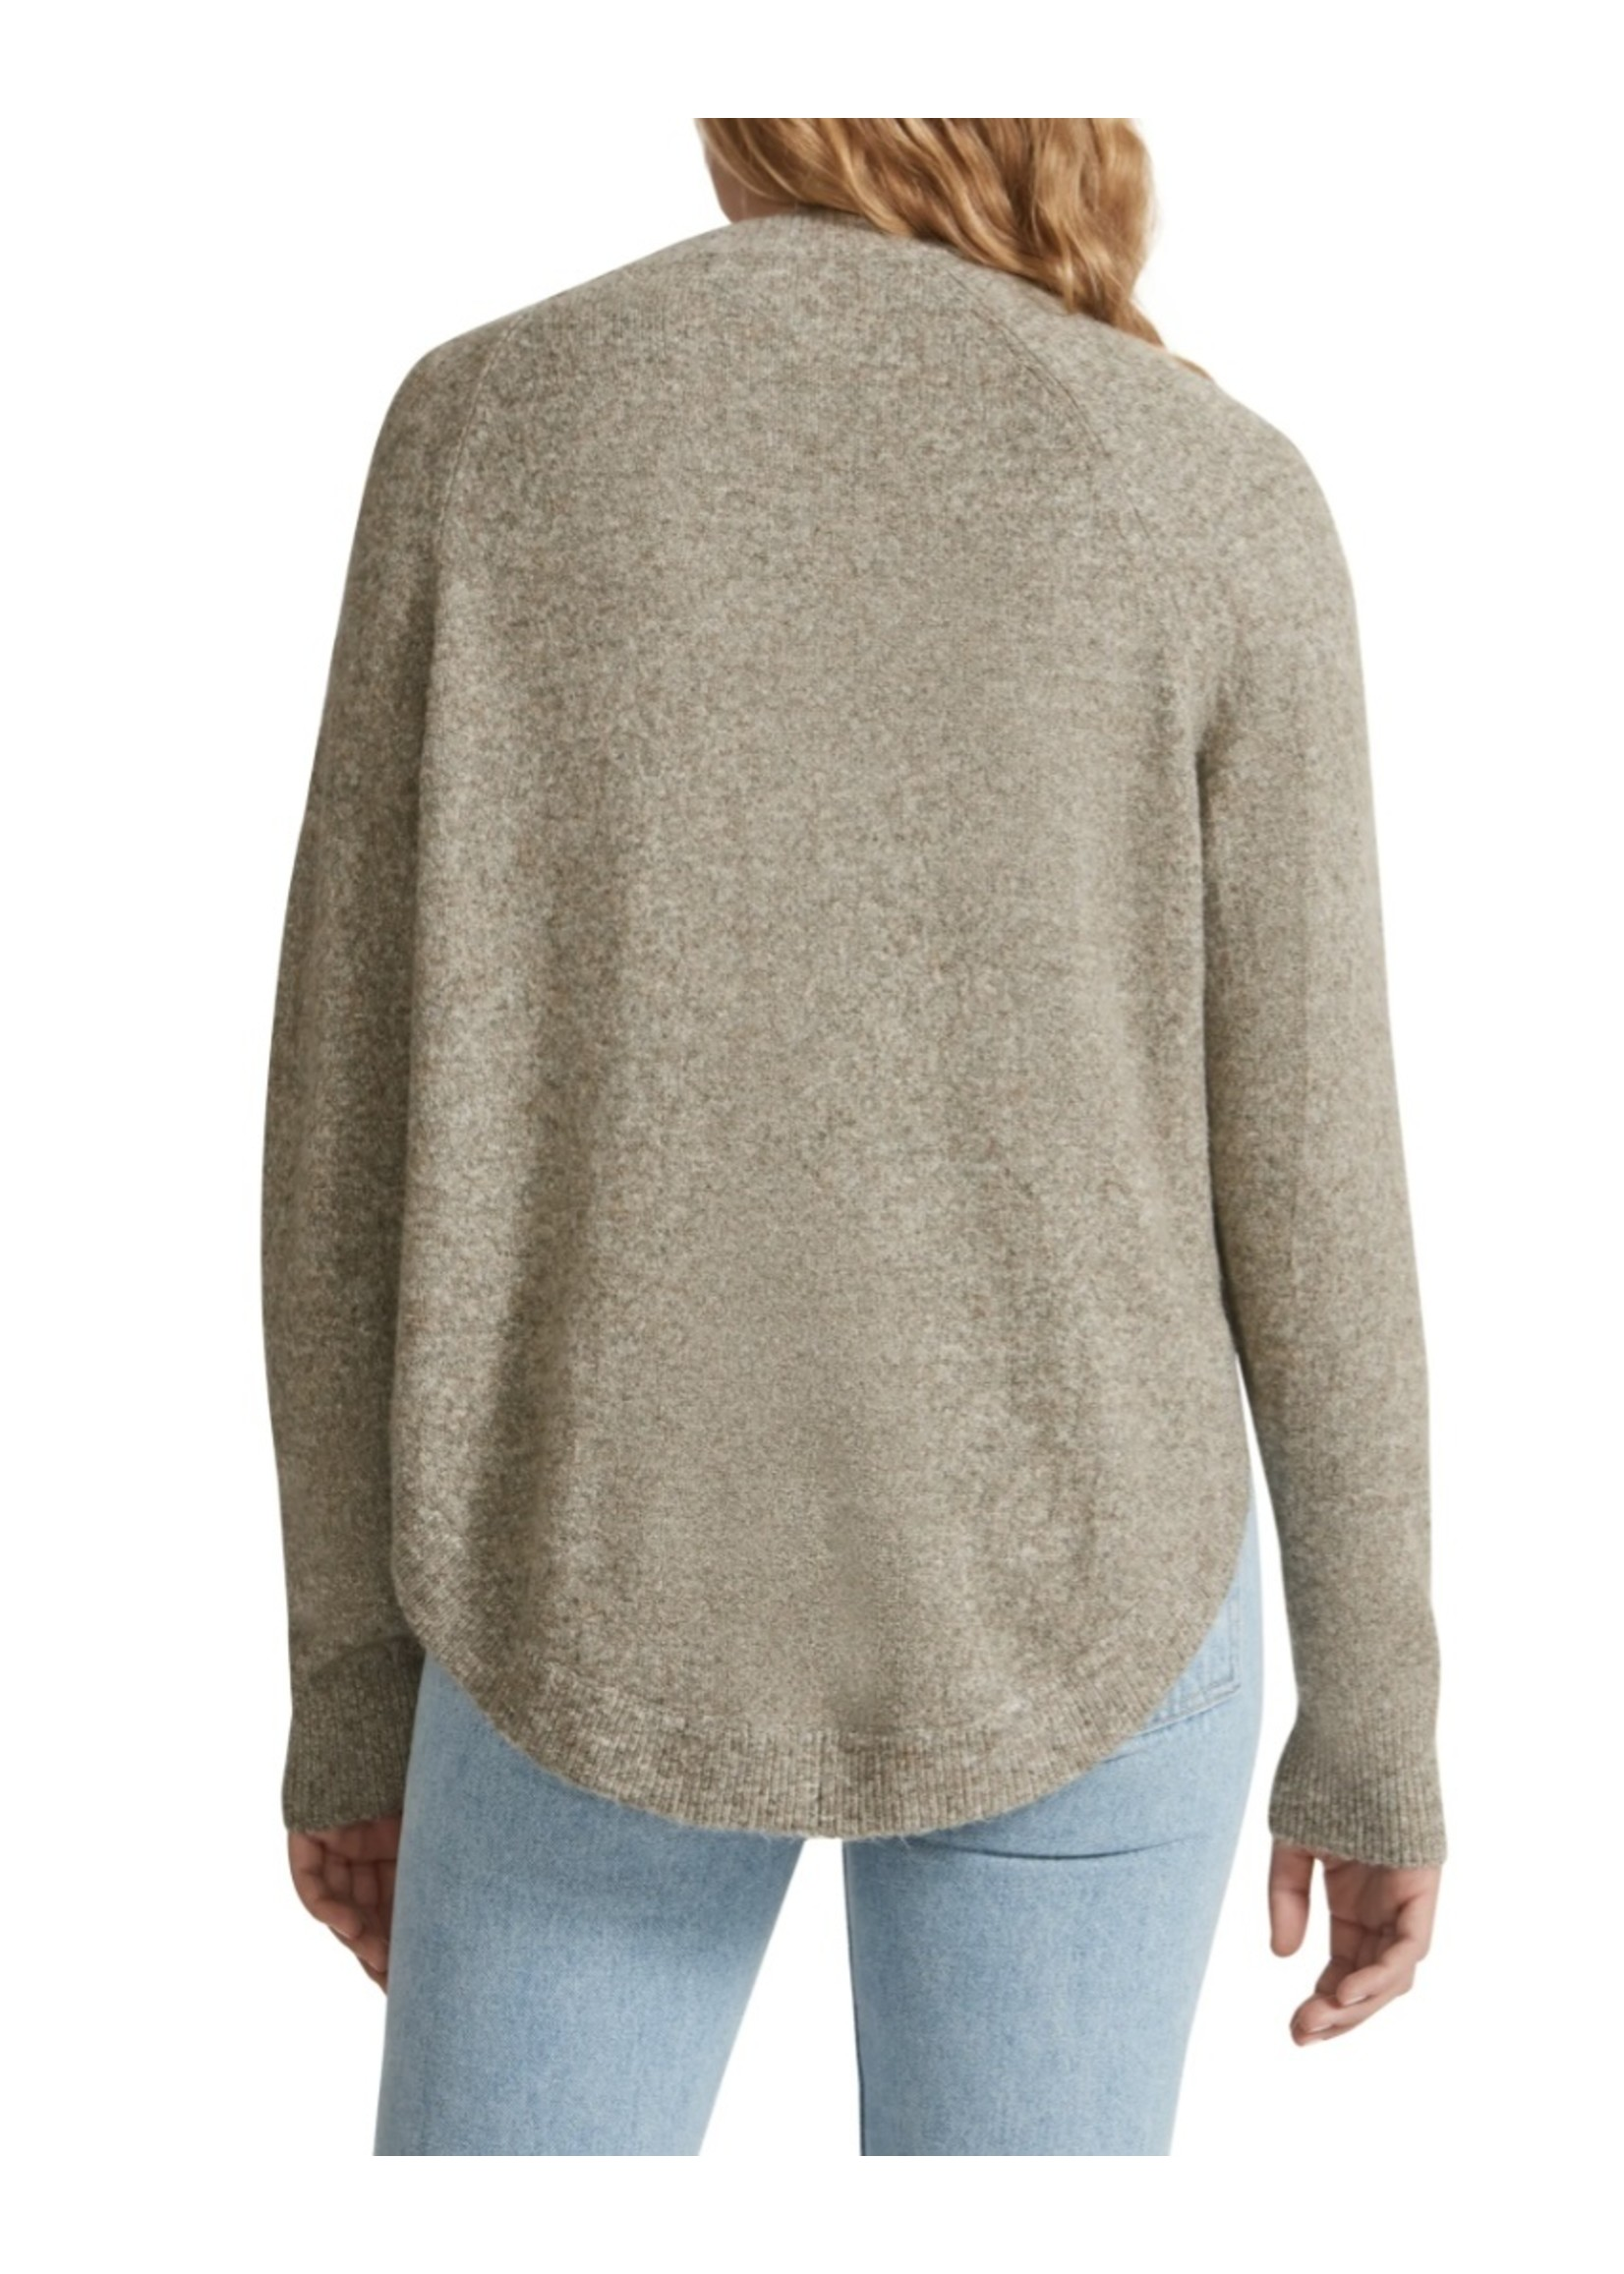 BB Dakota Learning Curve Sweater - BL306027